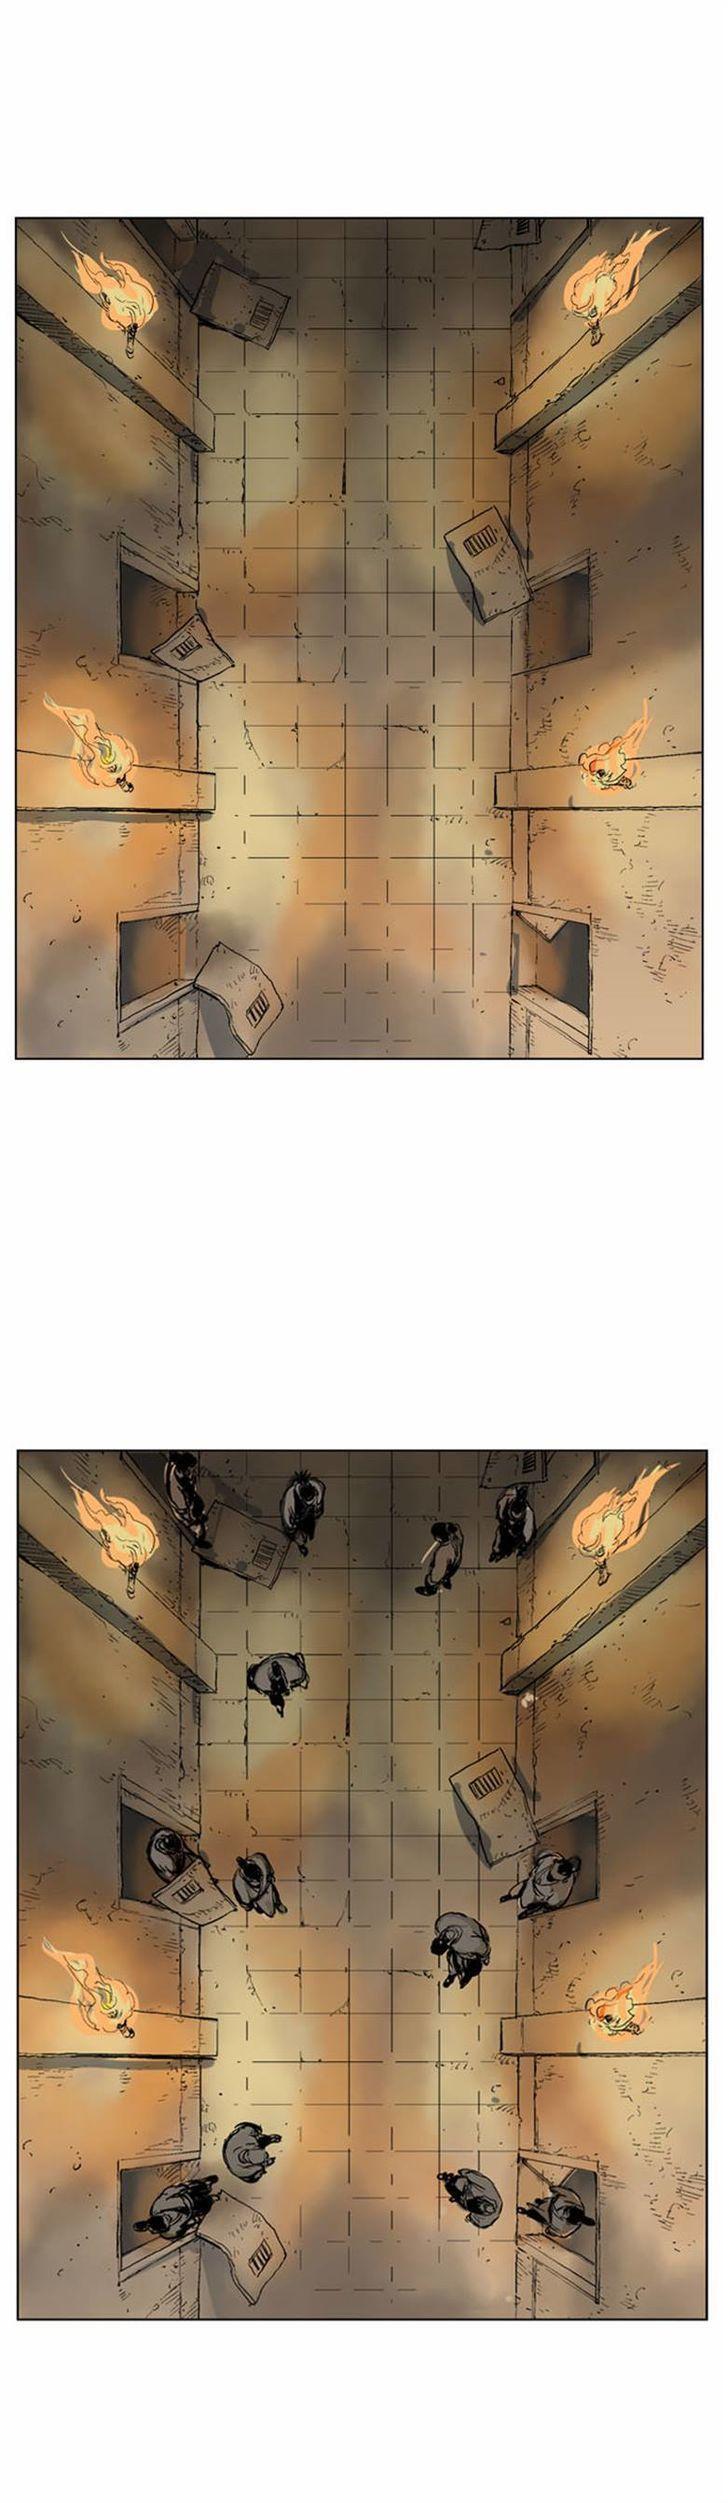 https://c5.ninemanga.com/es_manga/pic2/9/18249/517018/cde2d9ccd0e94745859e8b340f4d06c2.jpg Page 38